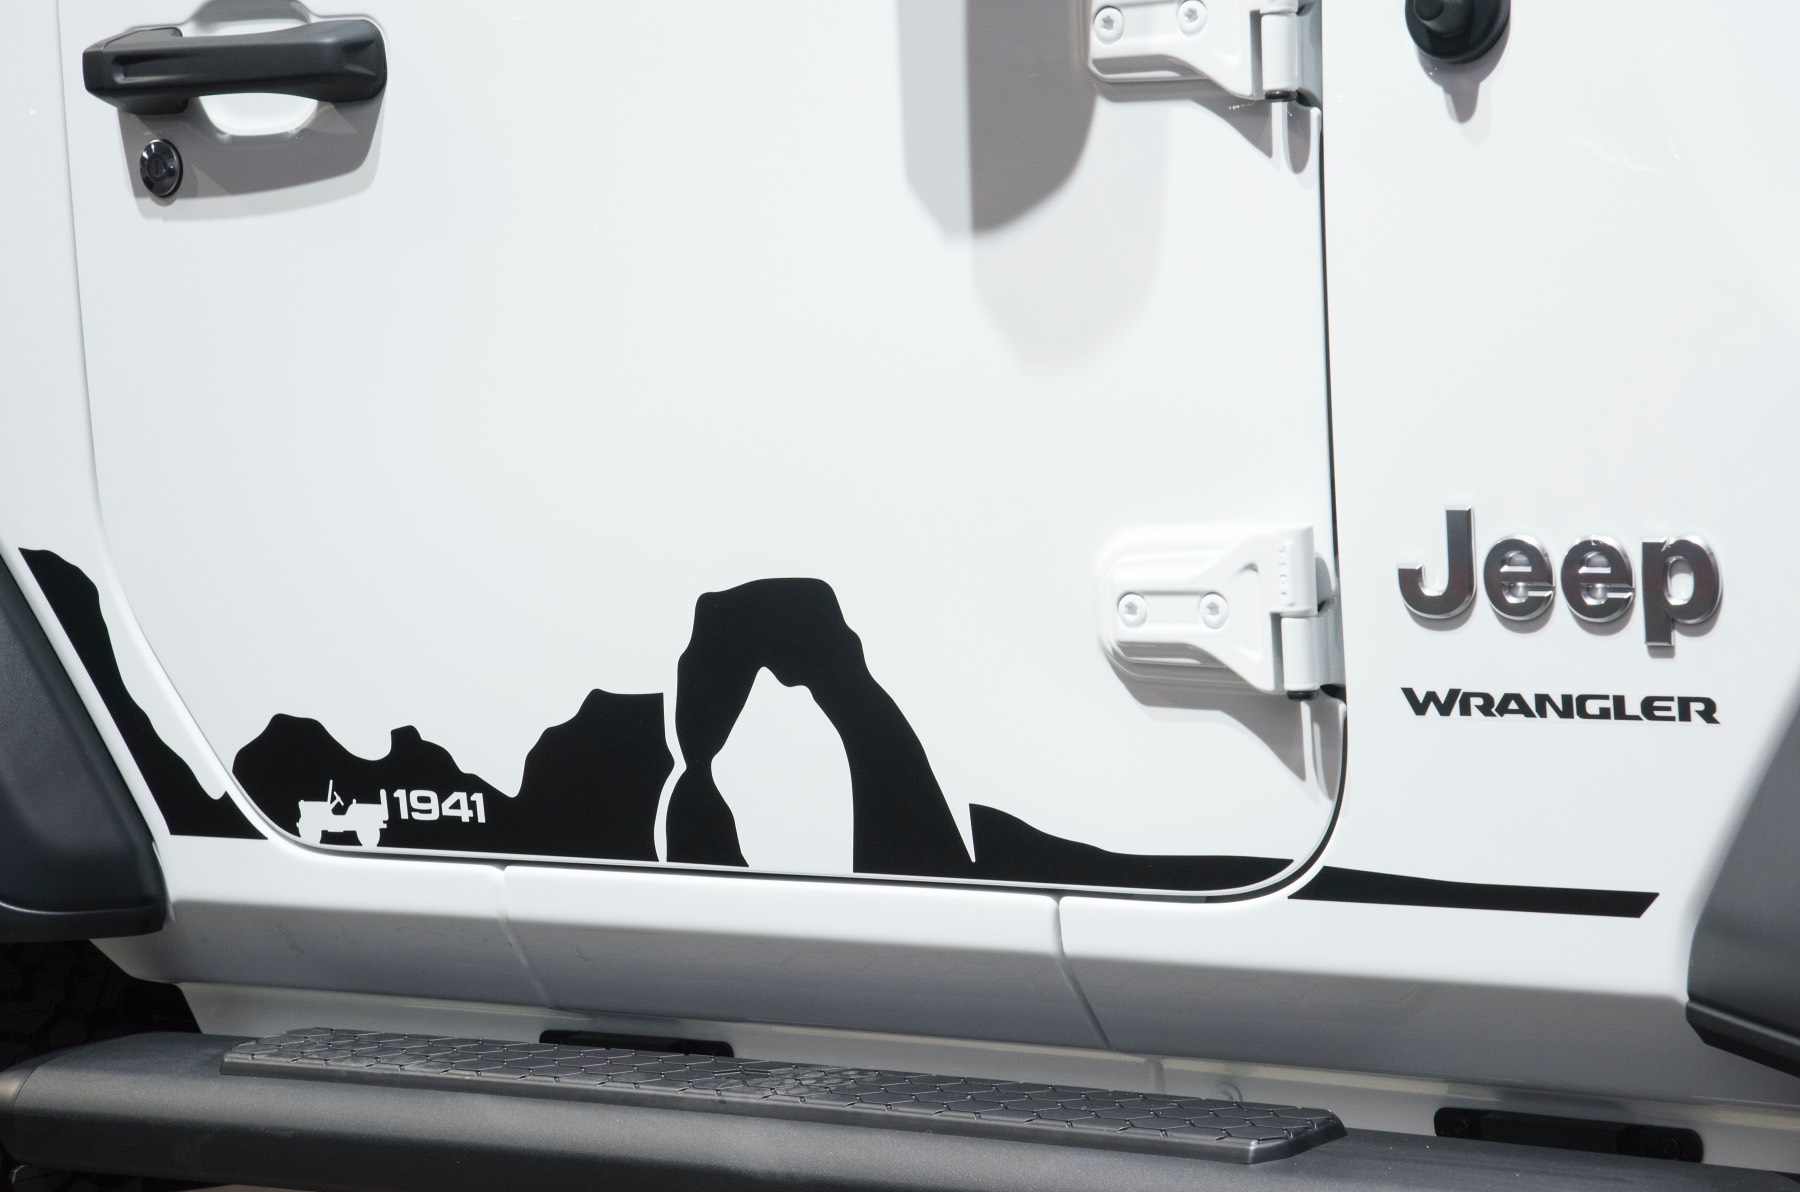 Jeep Wrangler Sport JL Mopar 2018